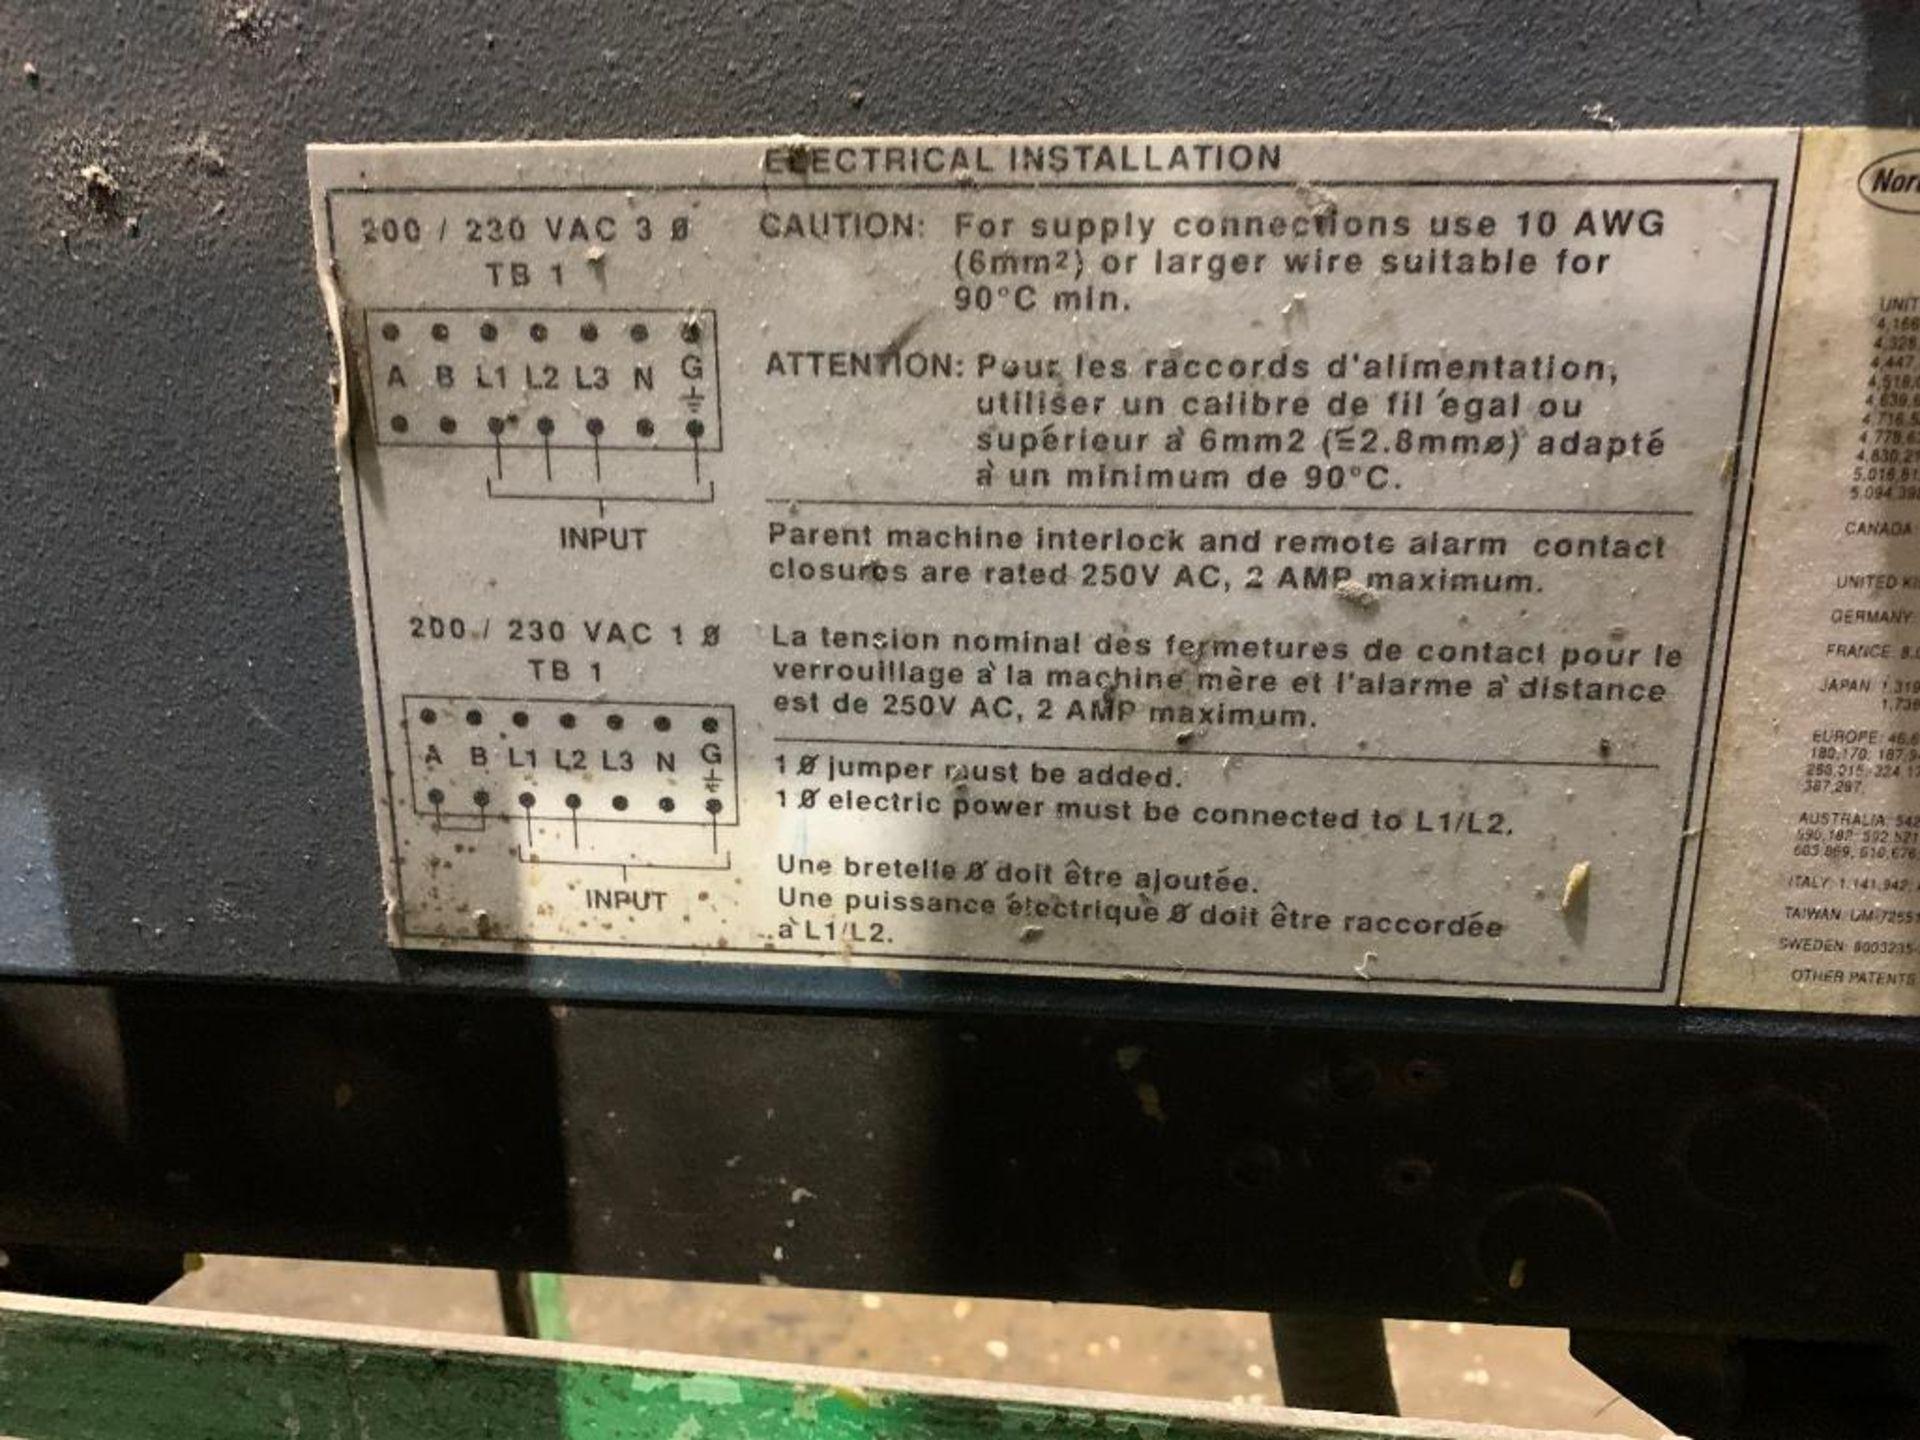 1978 Clybourn carton erecting filling closing machine - Image 8 of 68